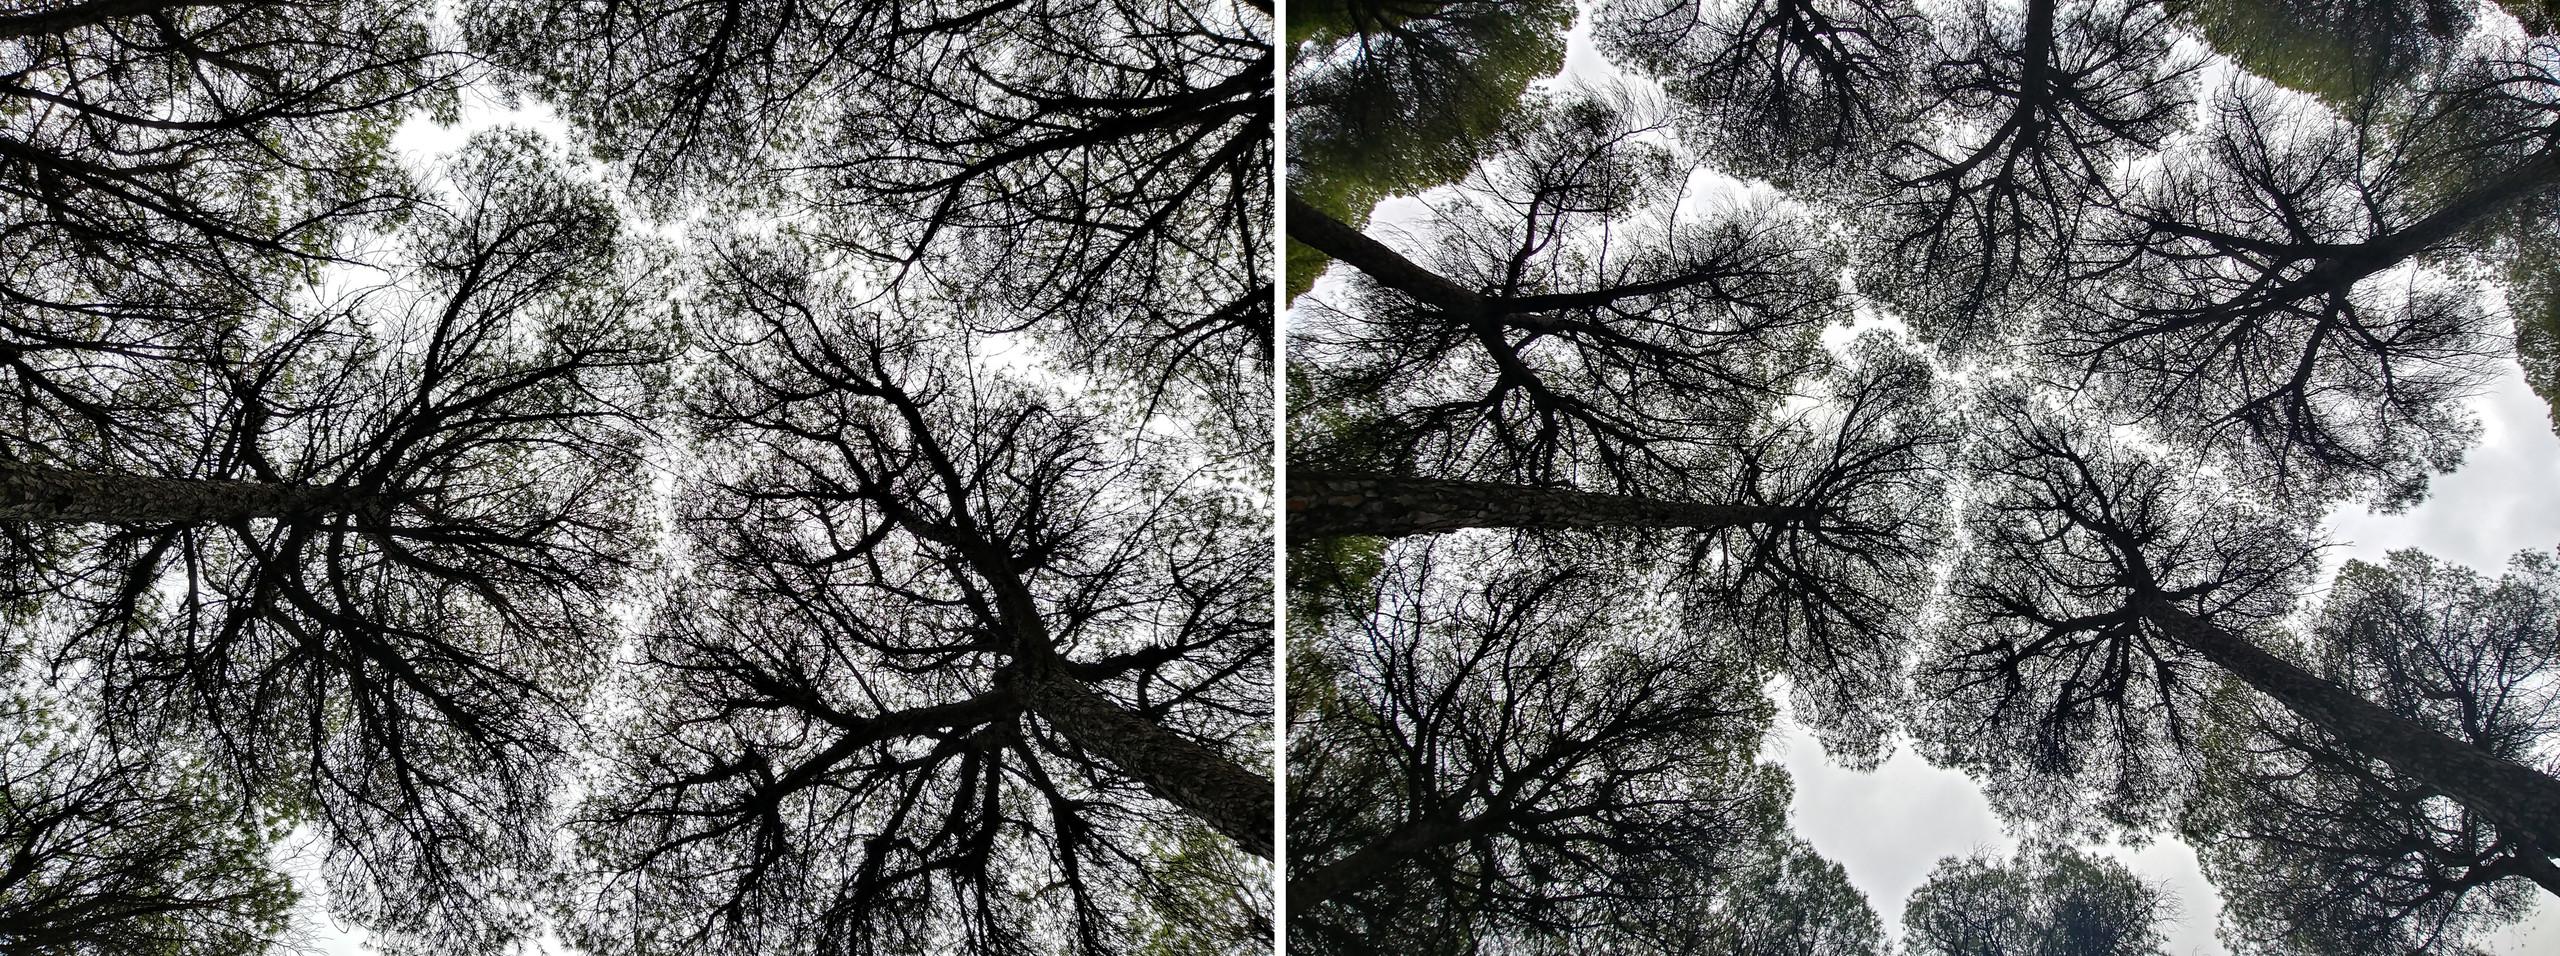 Foto de LG G6: cámara principal vs angular (7/9)